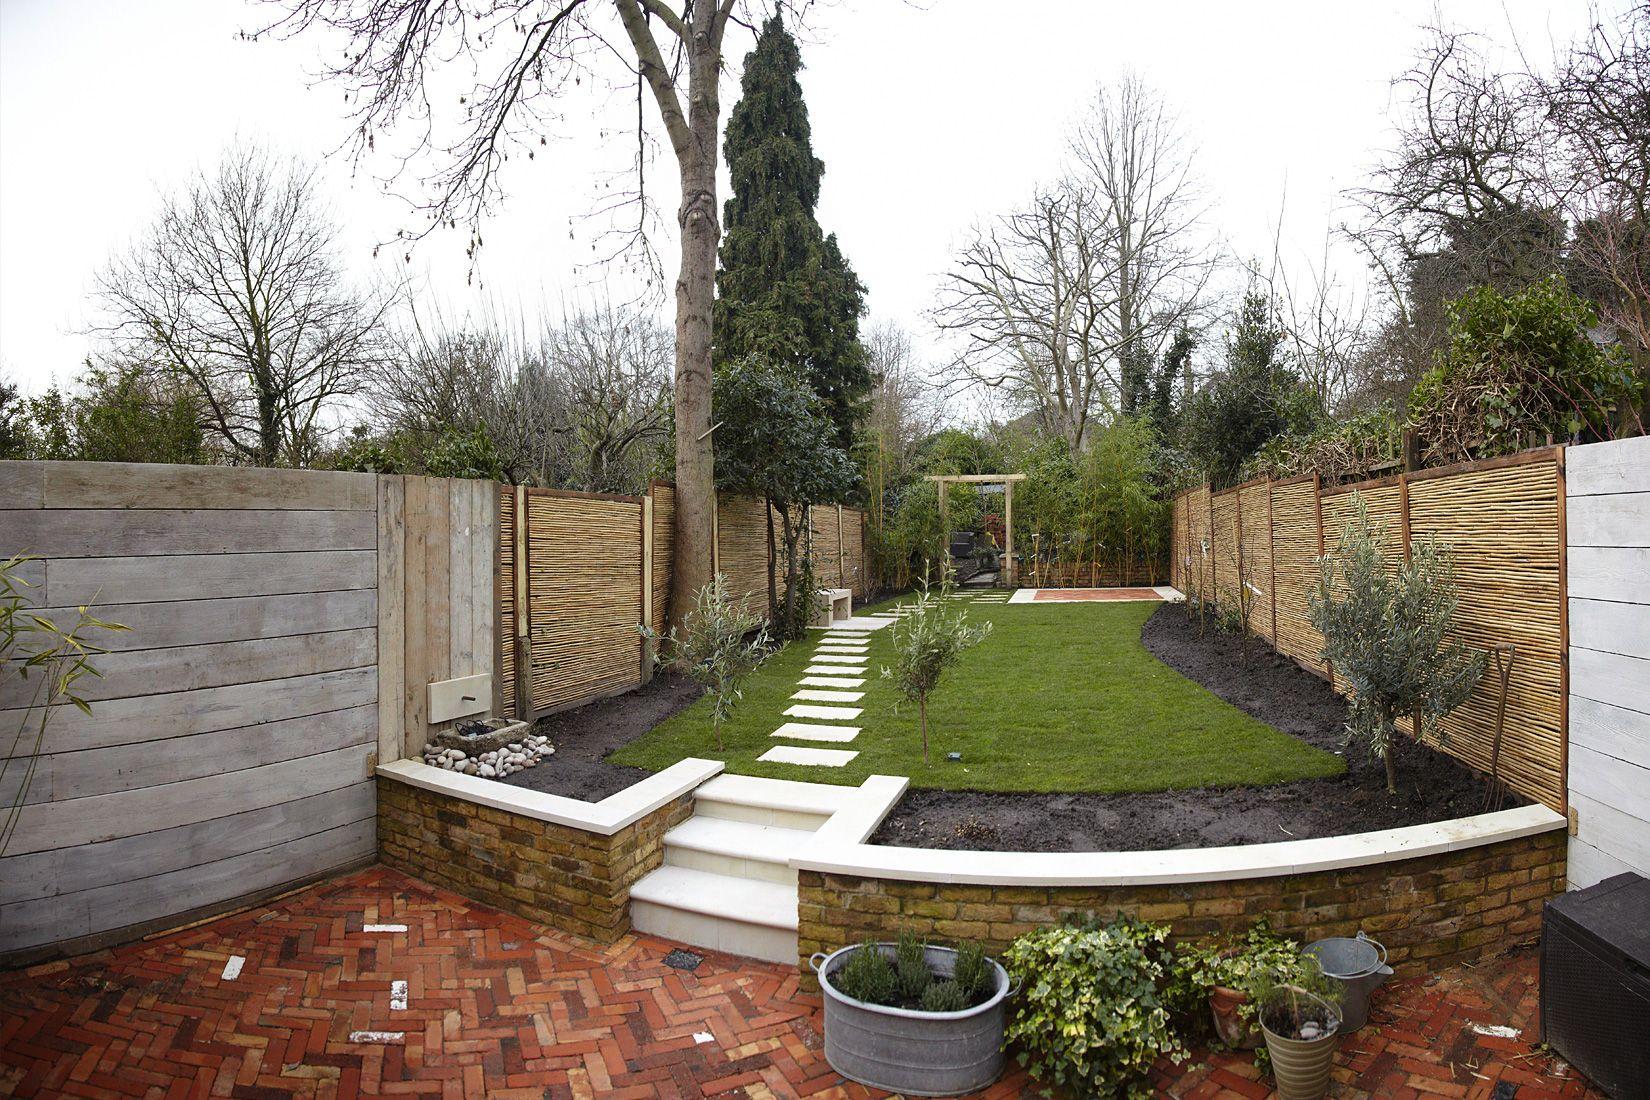 Split level garden | Garden | Pinterest | Gardens, Garden ... on Split Garden Ideas id=19364